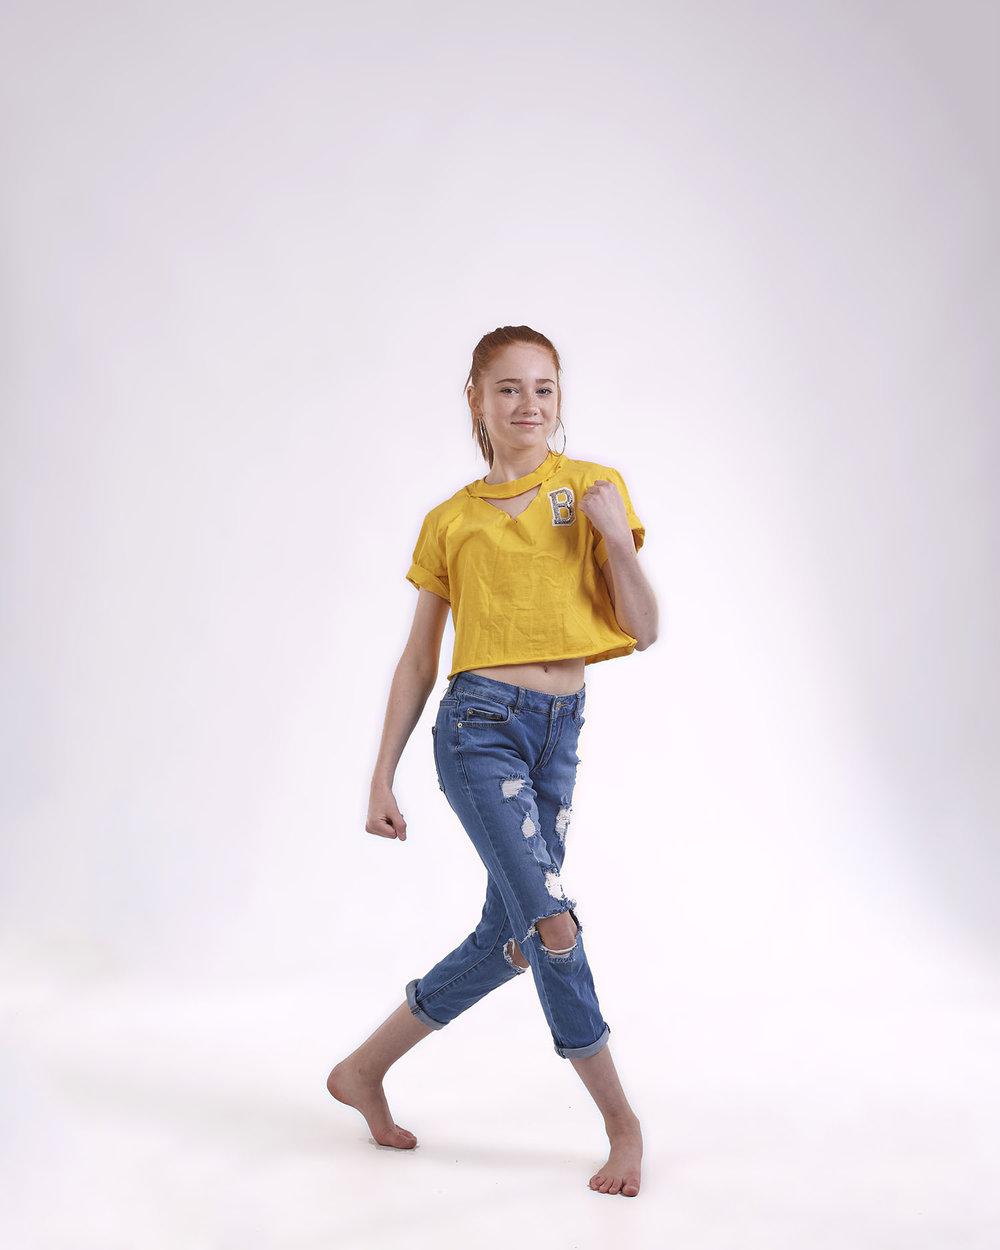 dancephotographercalgary_6000.jpg